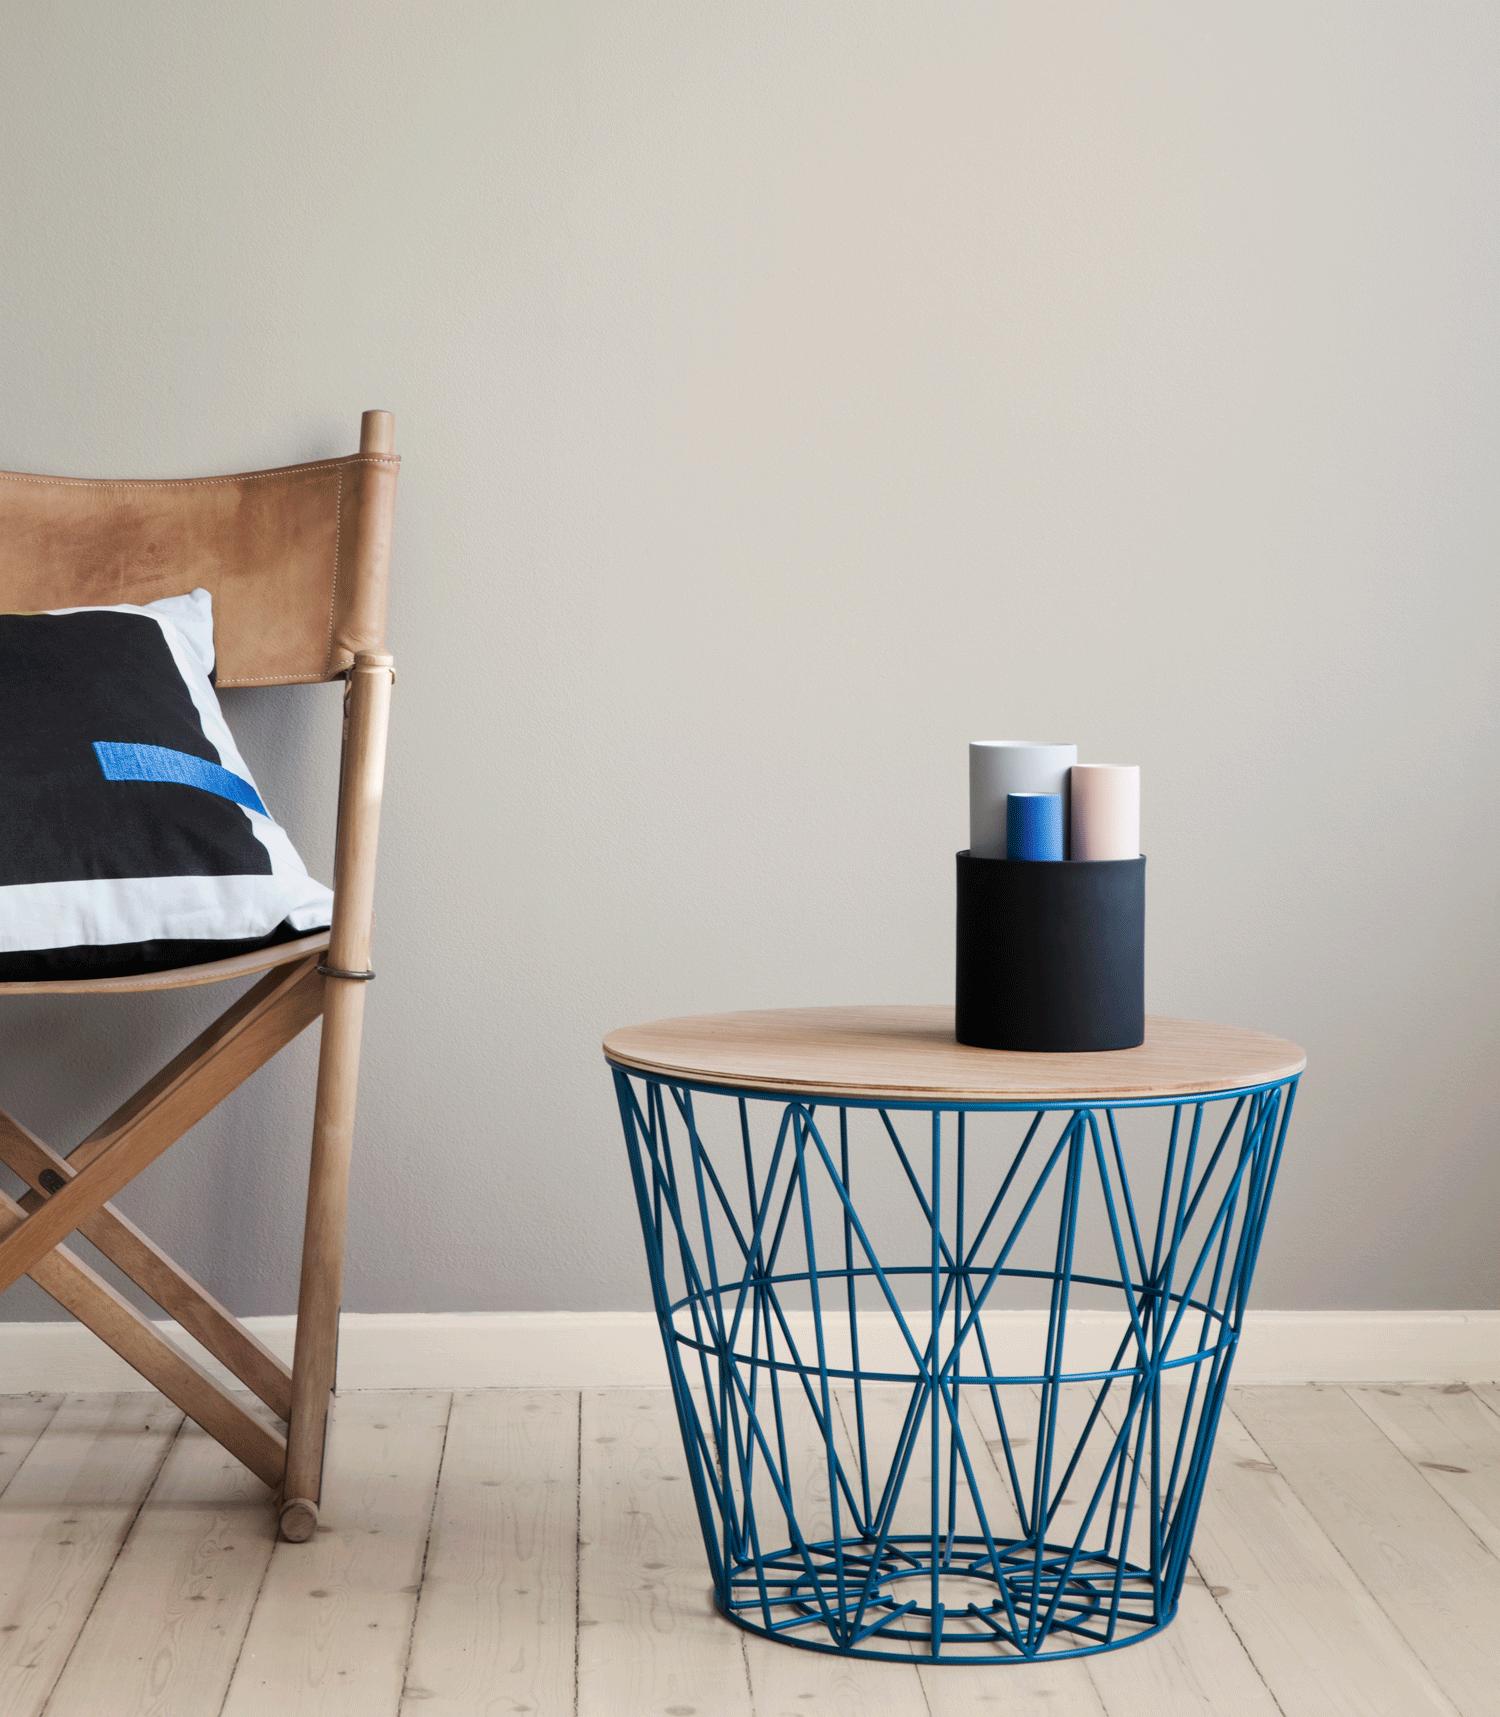 rangement 20 solutions esth tiques et astucieuses qui sortent du placard madame figaro. Black Bedroom Furniture Sets. Home Design Ideas